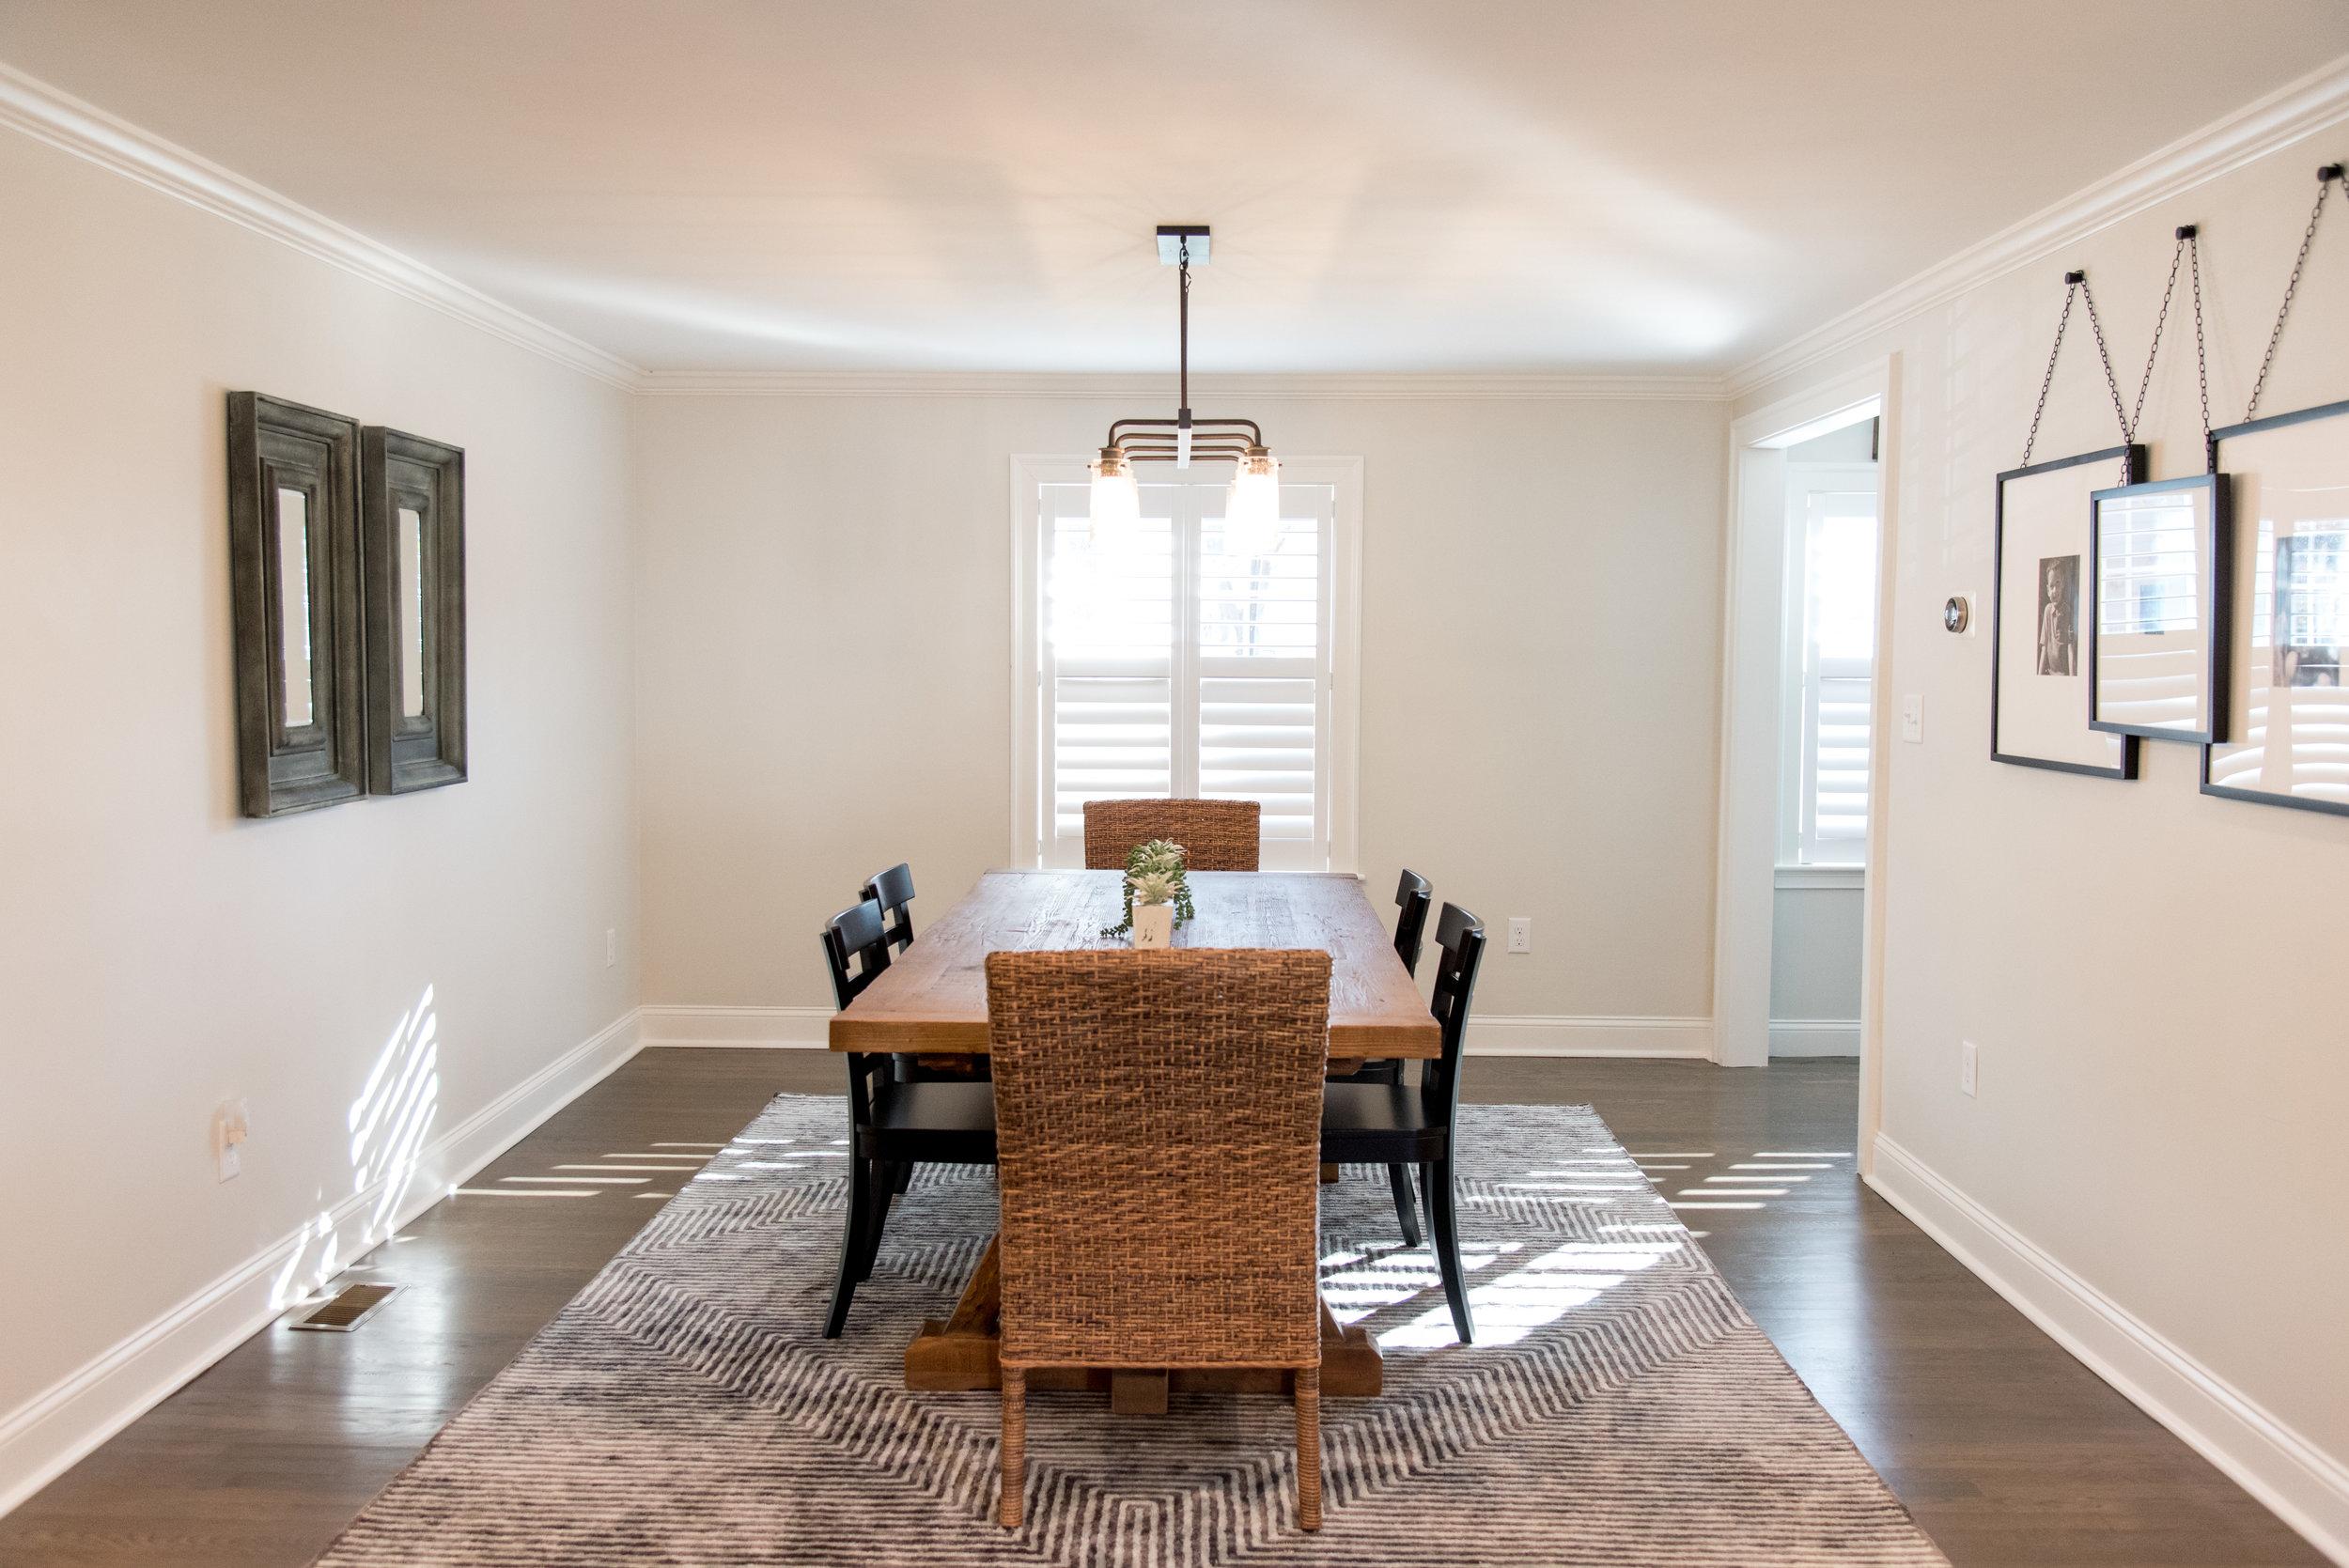 Interior Design Newton Massachusetts decor interior designer Gina Baran Dining Room Design